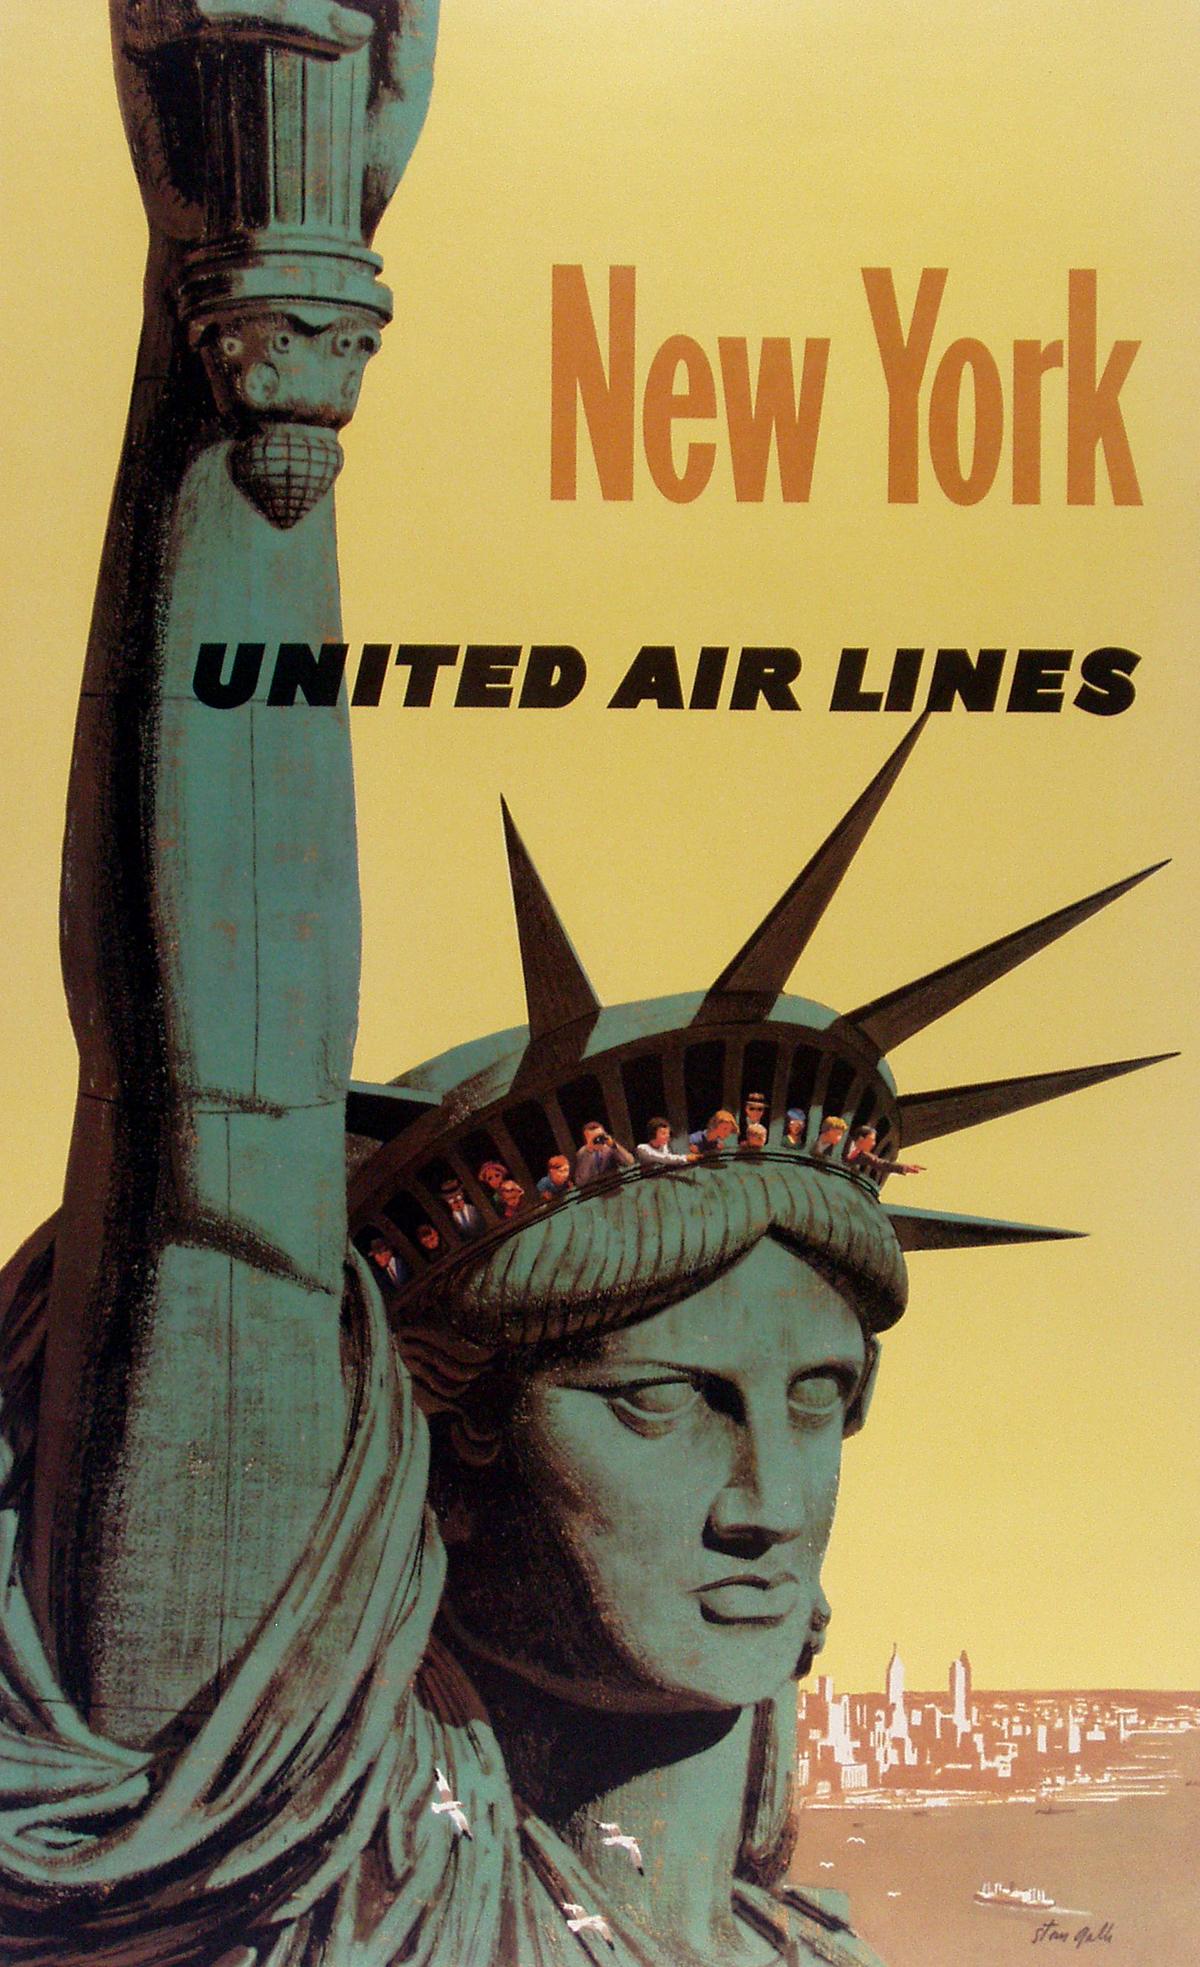 united airlines posters vintage european posters. Black Bedroom Furniture Sets. Home Design Ideas